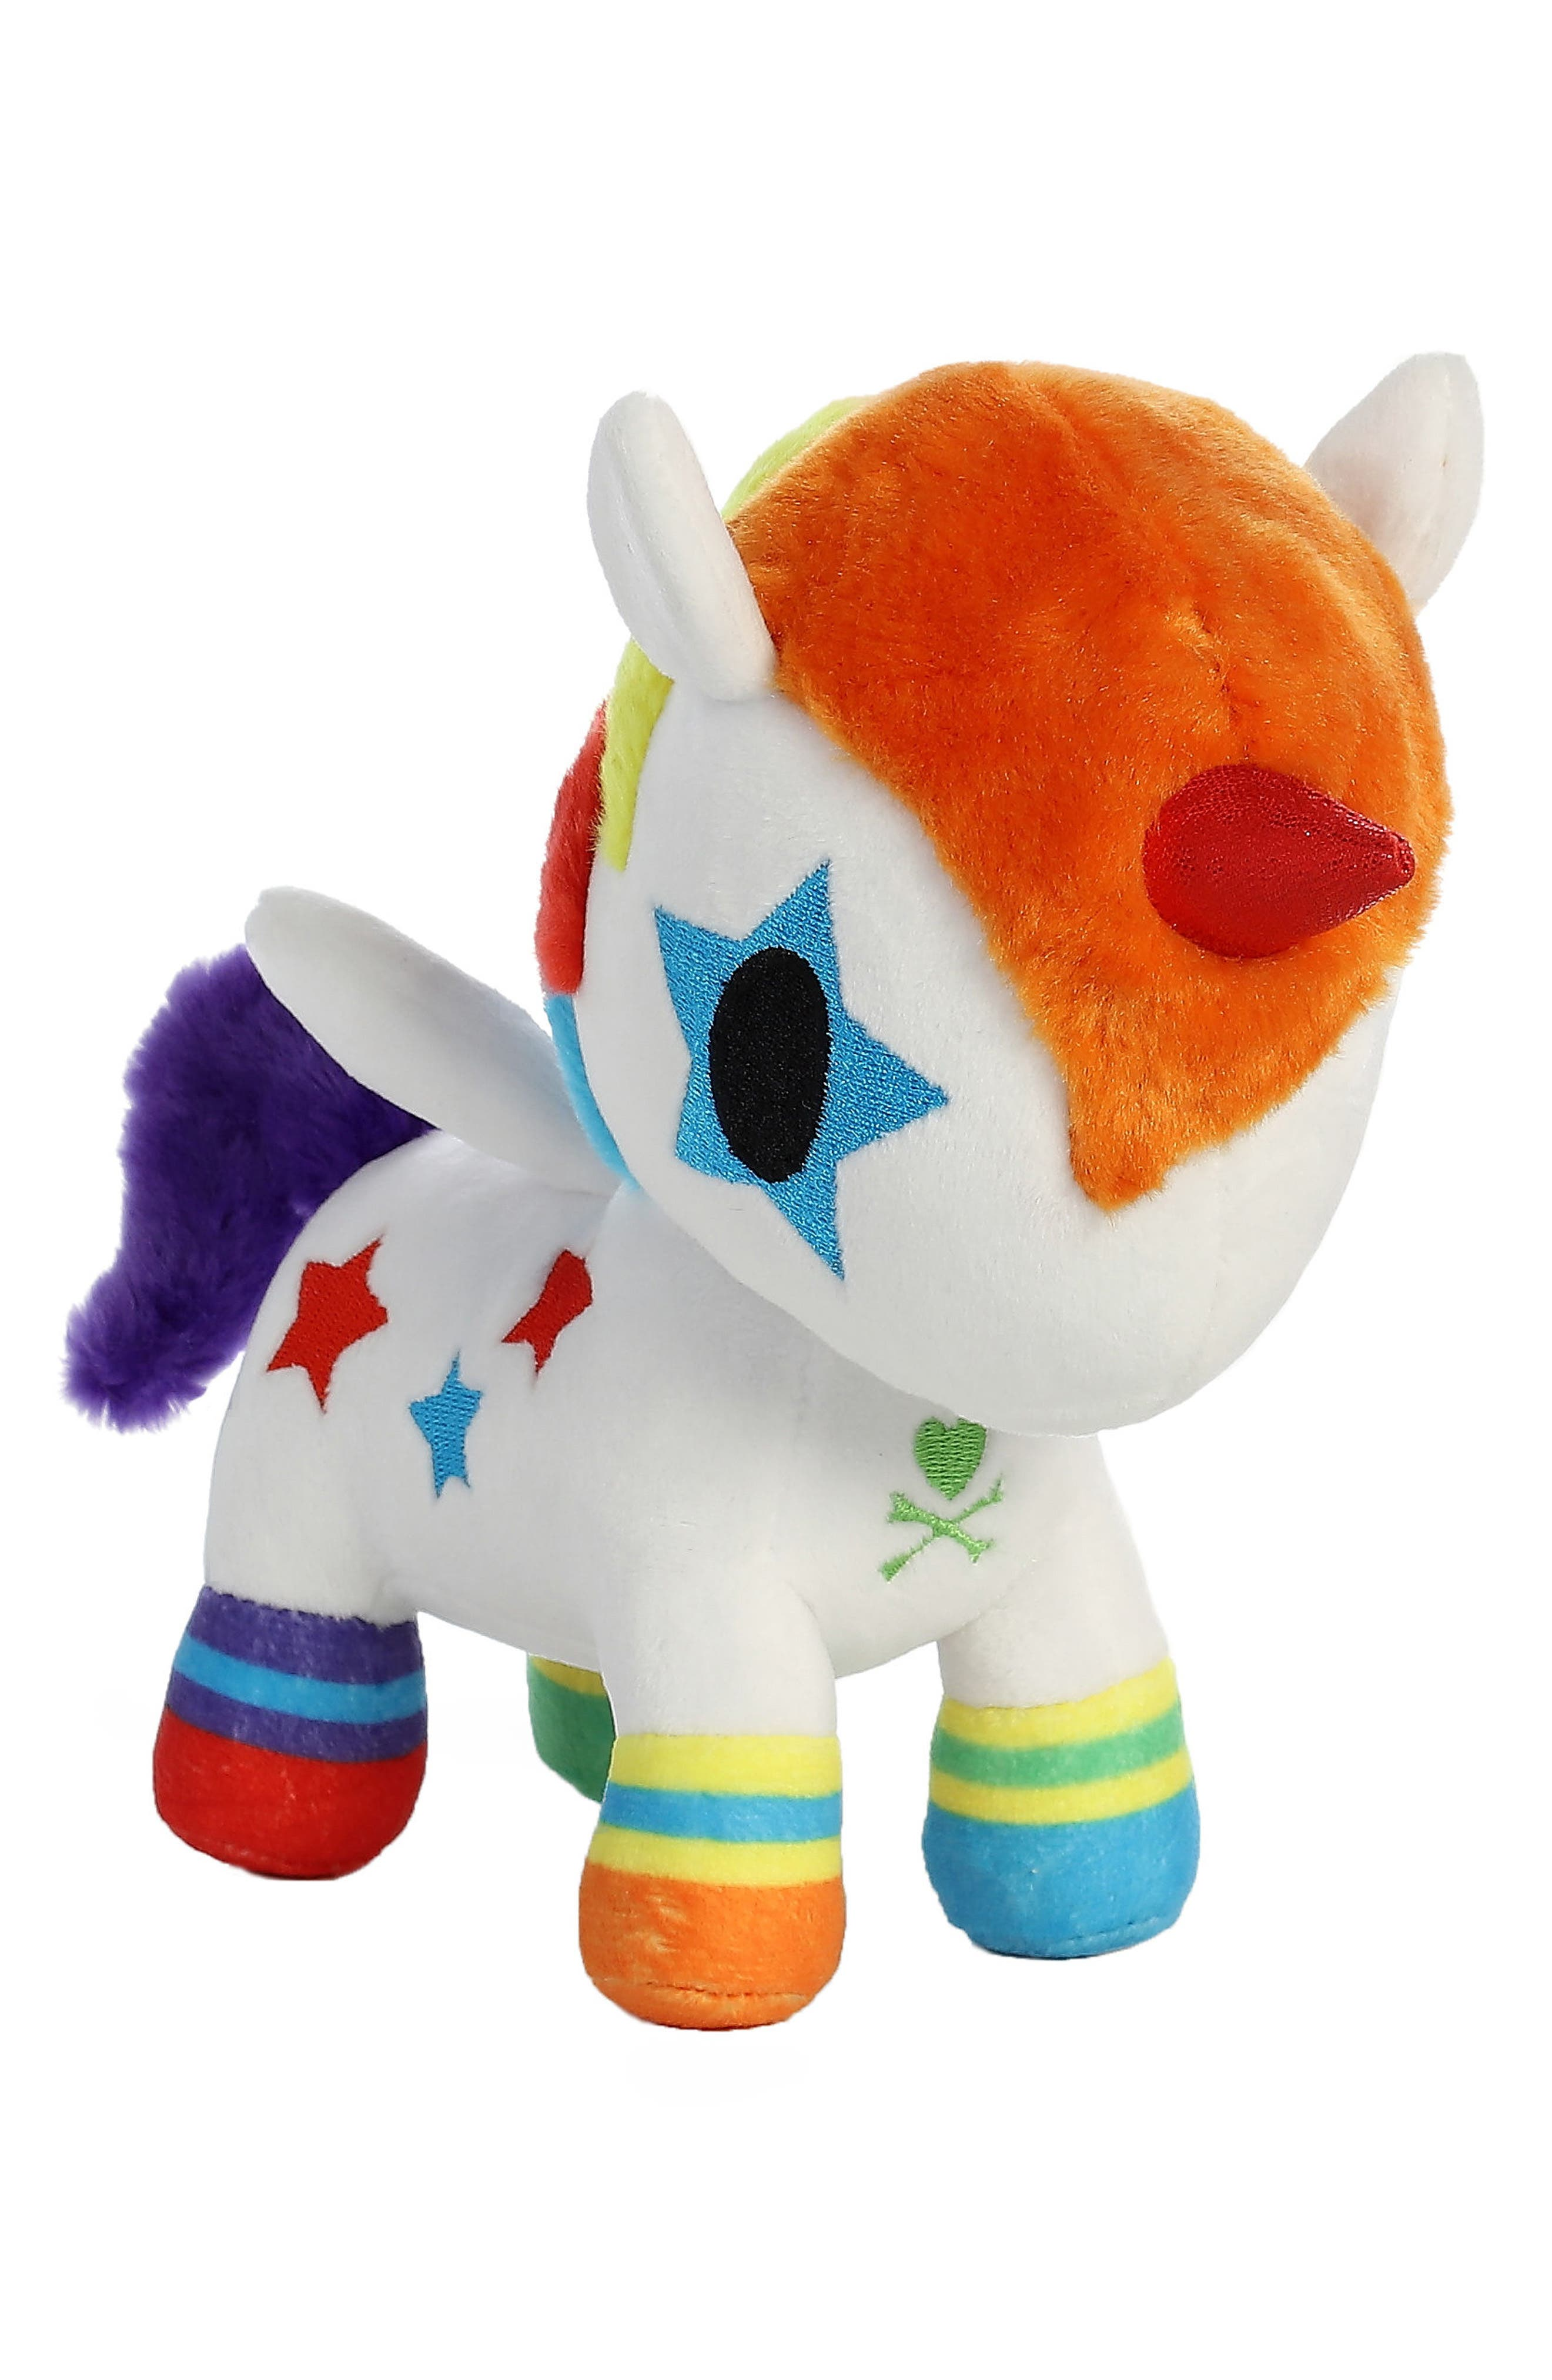 Main Image - Aurora World Toys x tokidoki Bowie Unicorno Stuffed Animal